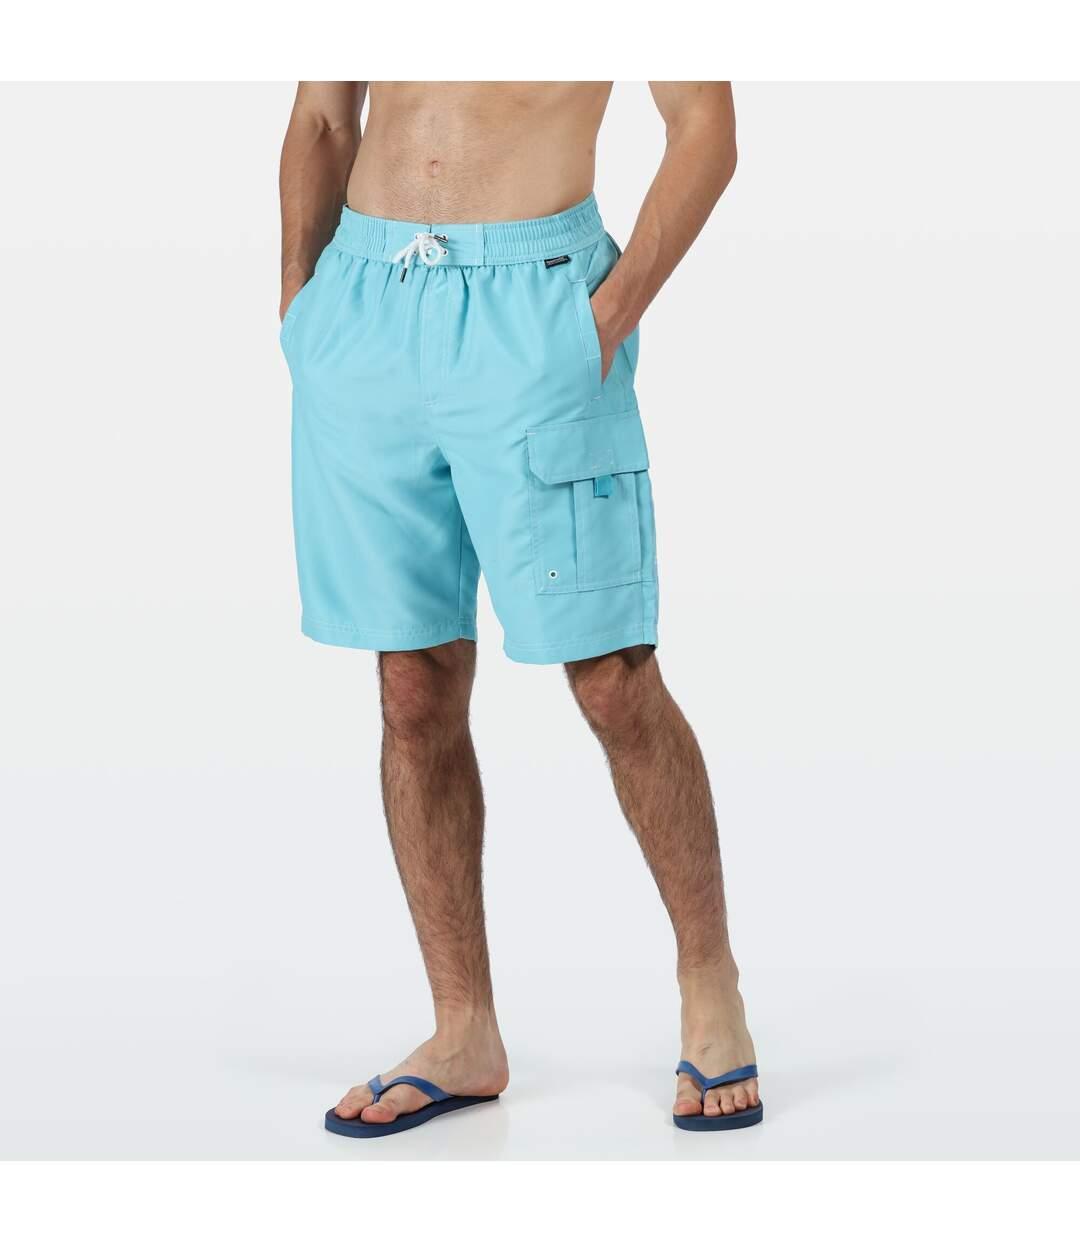 Regatta Mens Hotham III Mesh Quick Drying Board Shorts (Maui Blue) - UTRG4174